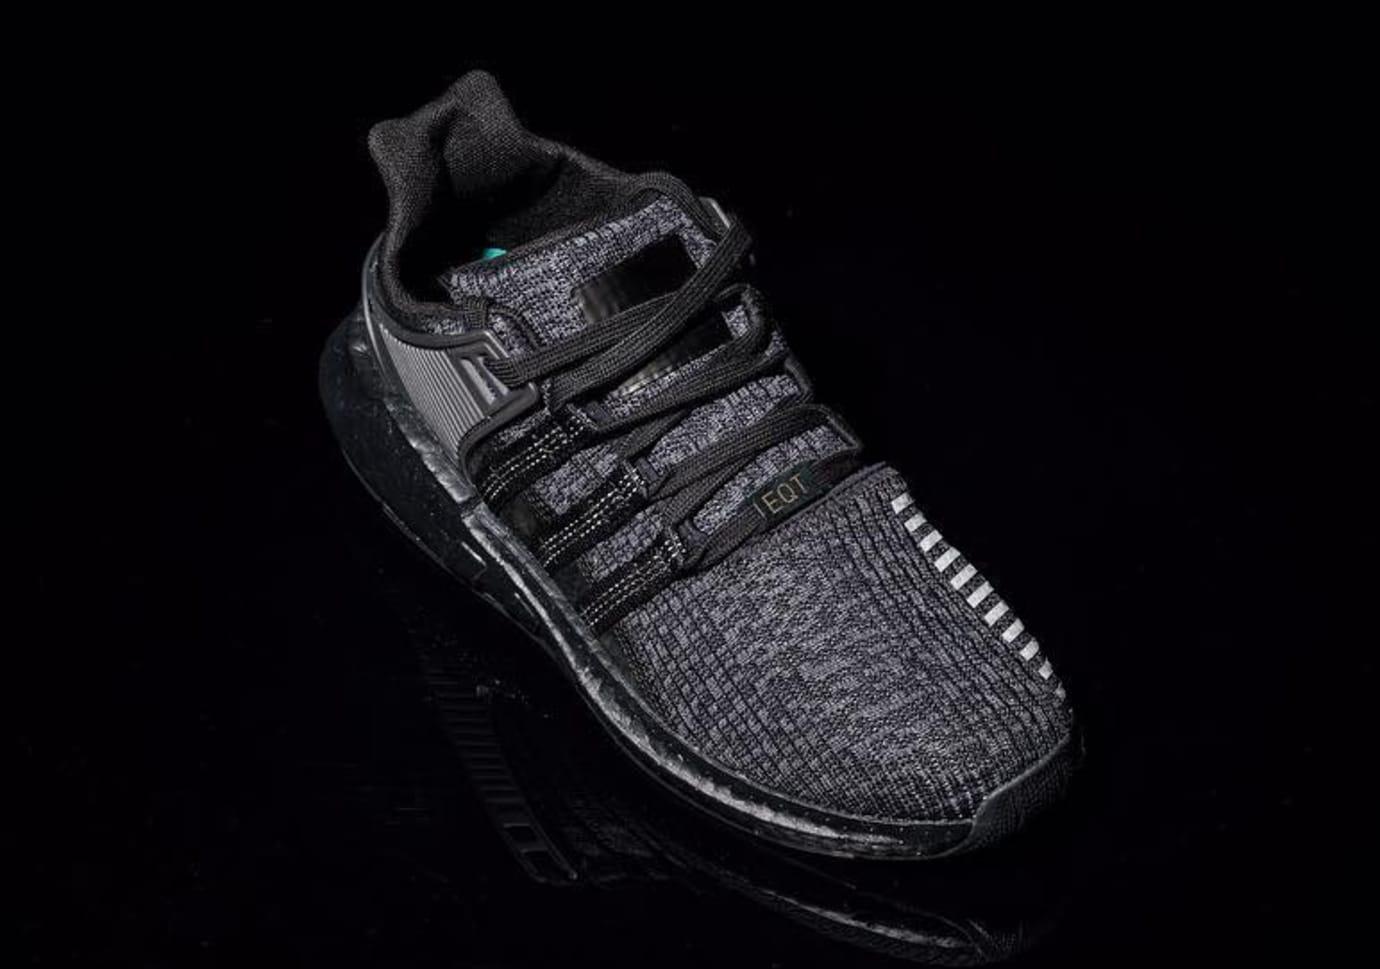 Triple Black Adidas EQT Support 93/17 Boost